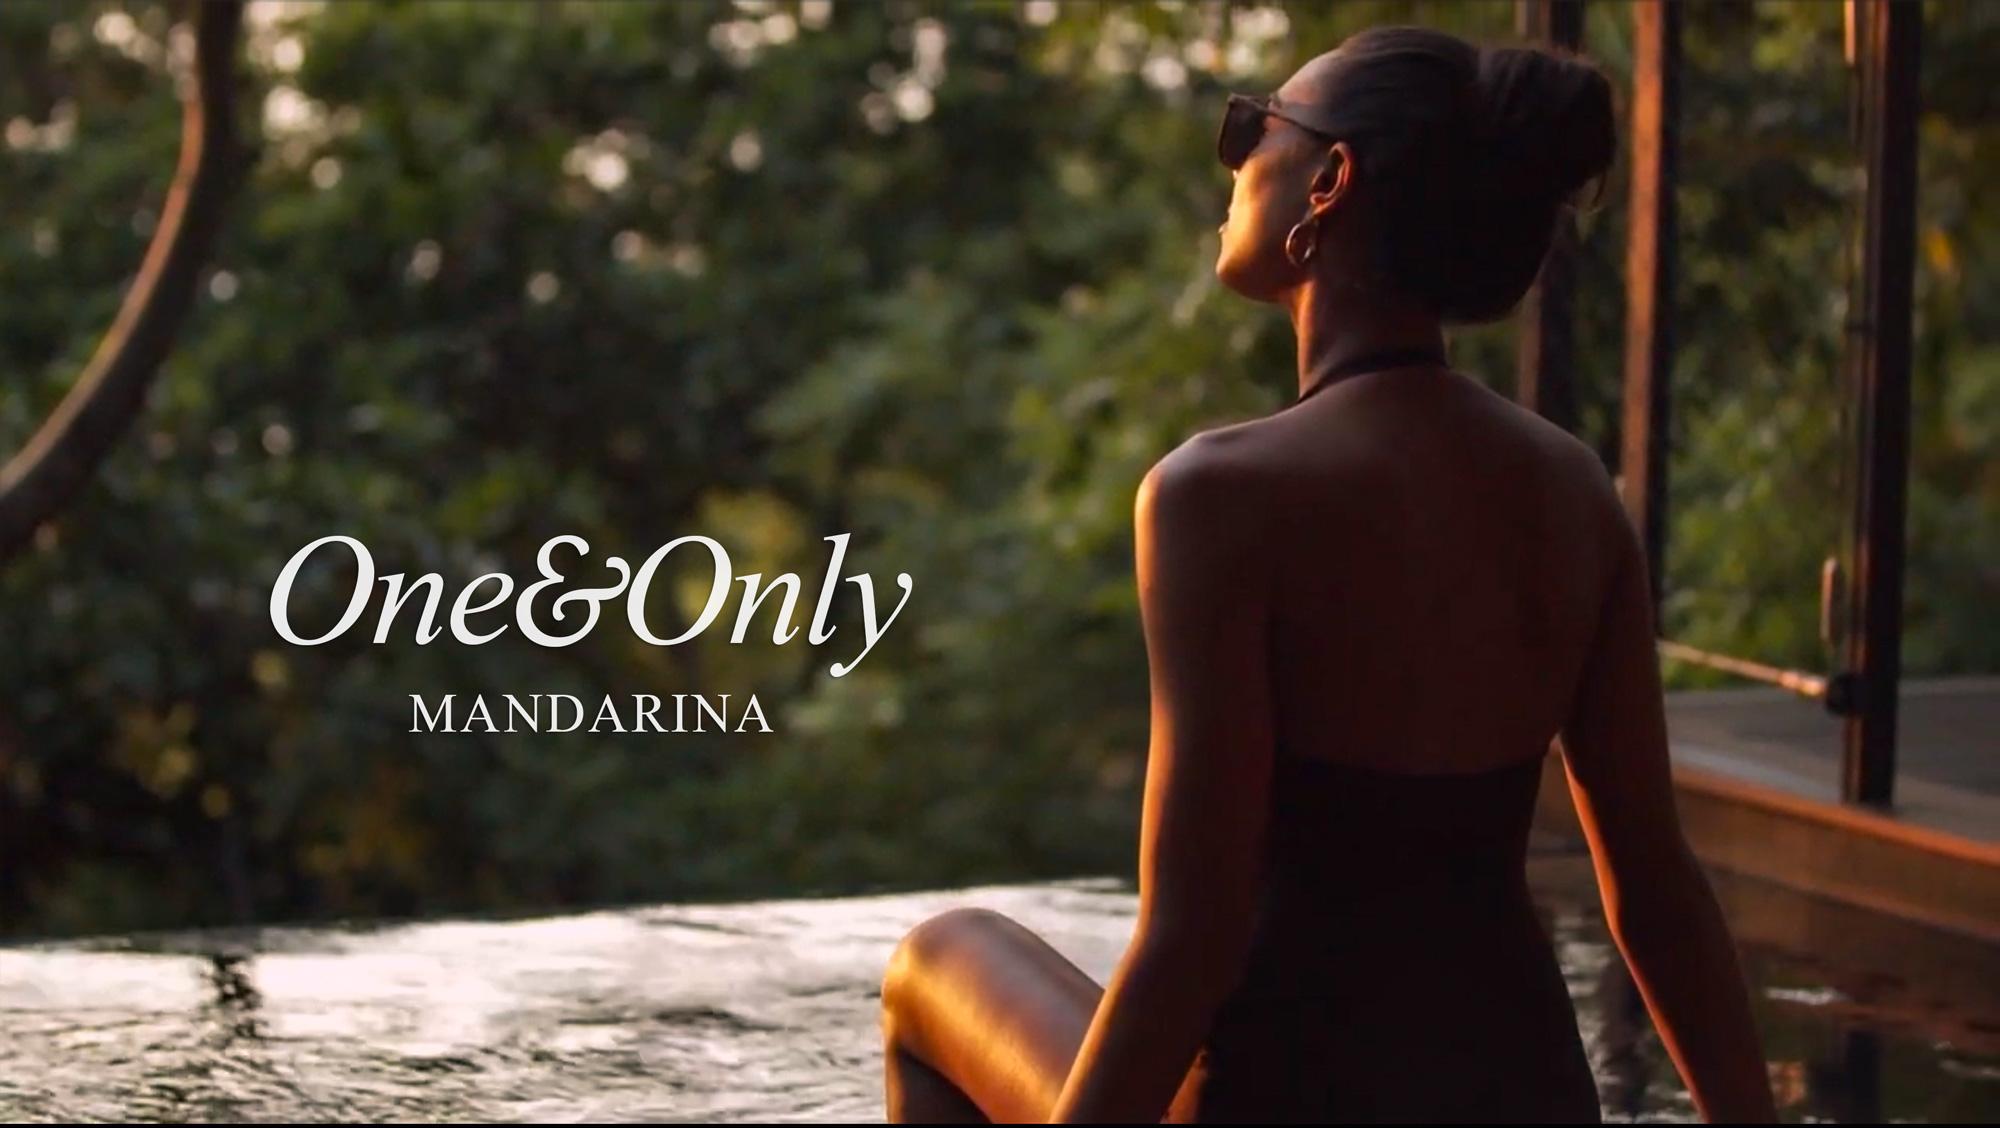 One&Only Mandarina, Riviera Nayarit, Mexico